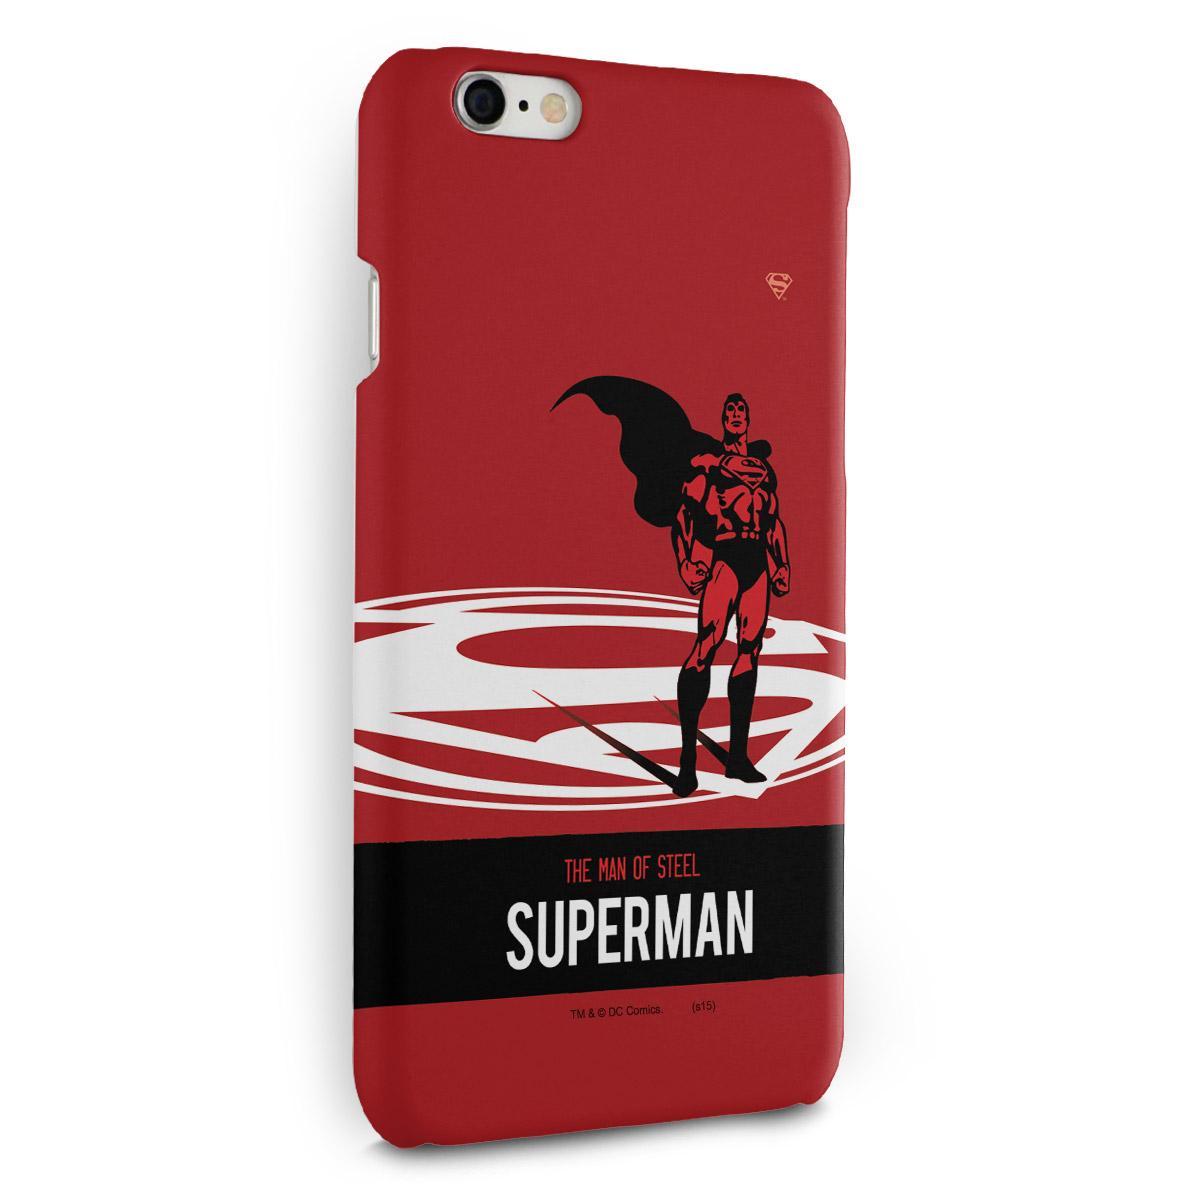 Capa para iPhone 6/6S Plus Superman The Man of Steel